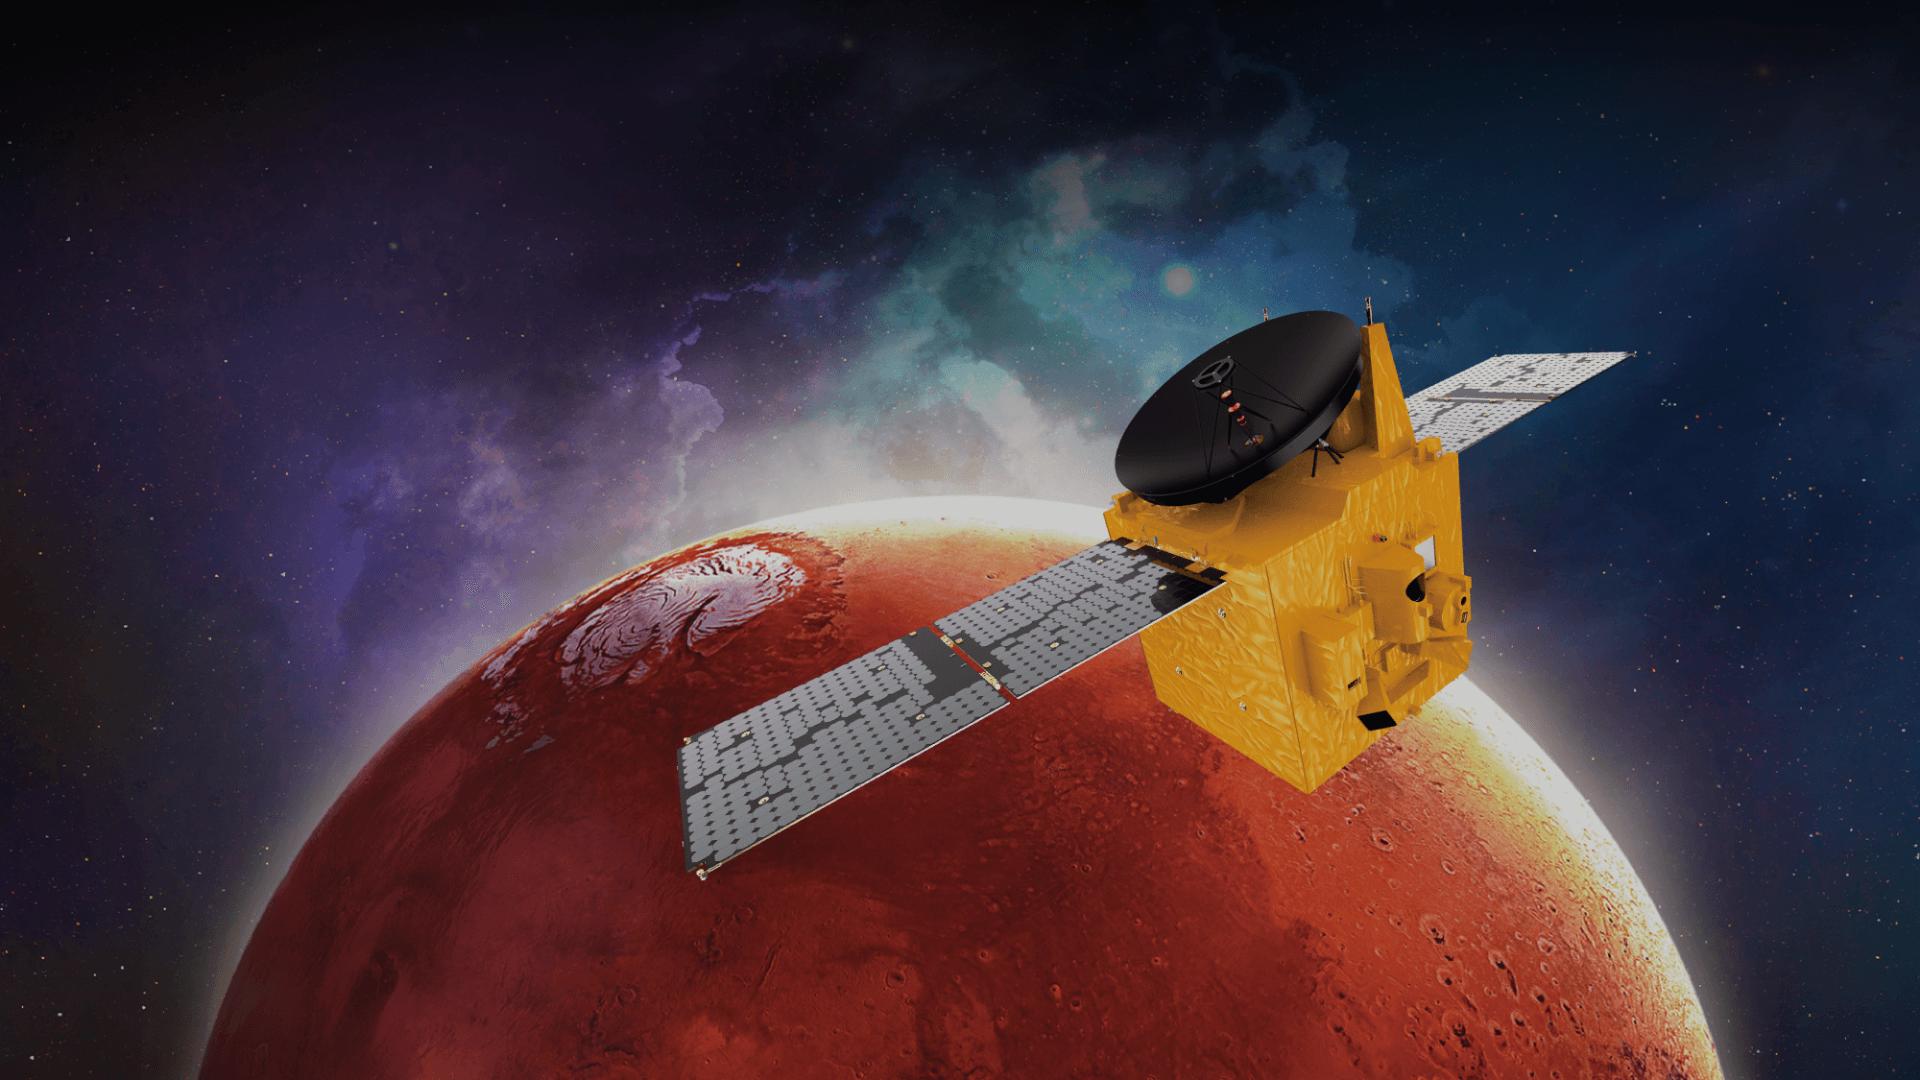 UAEの探査機「ホープ」が火星に到達、世界で5番目